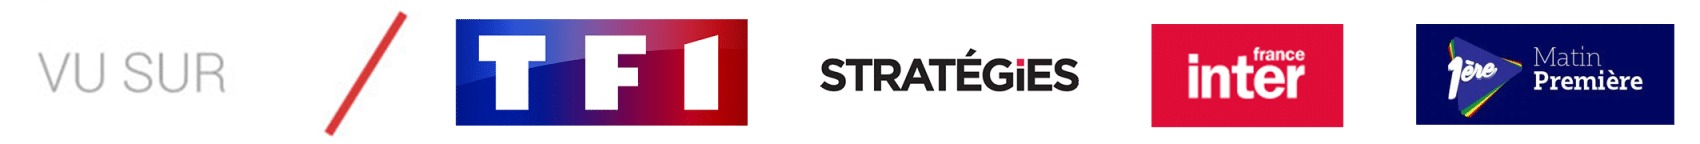 Nicolas Kern, TF1, Stratégies, France Inter